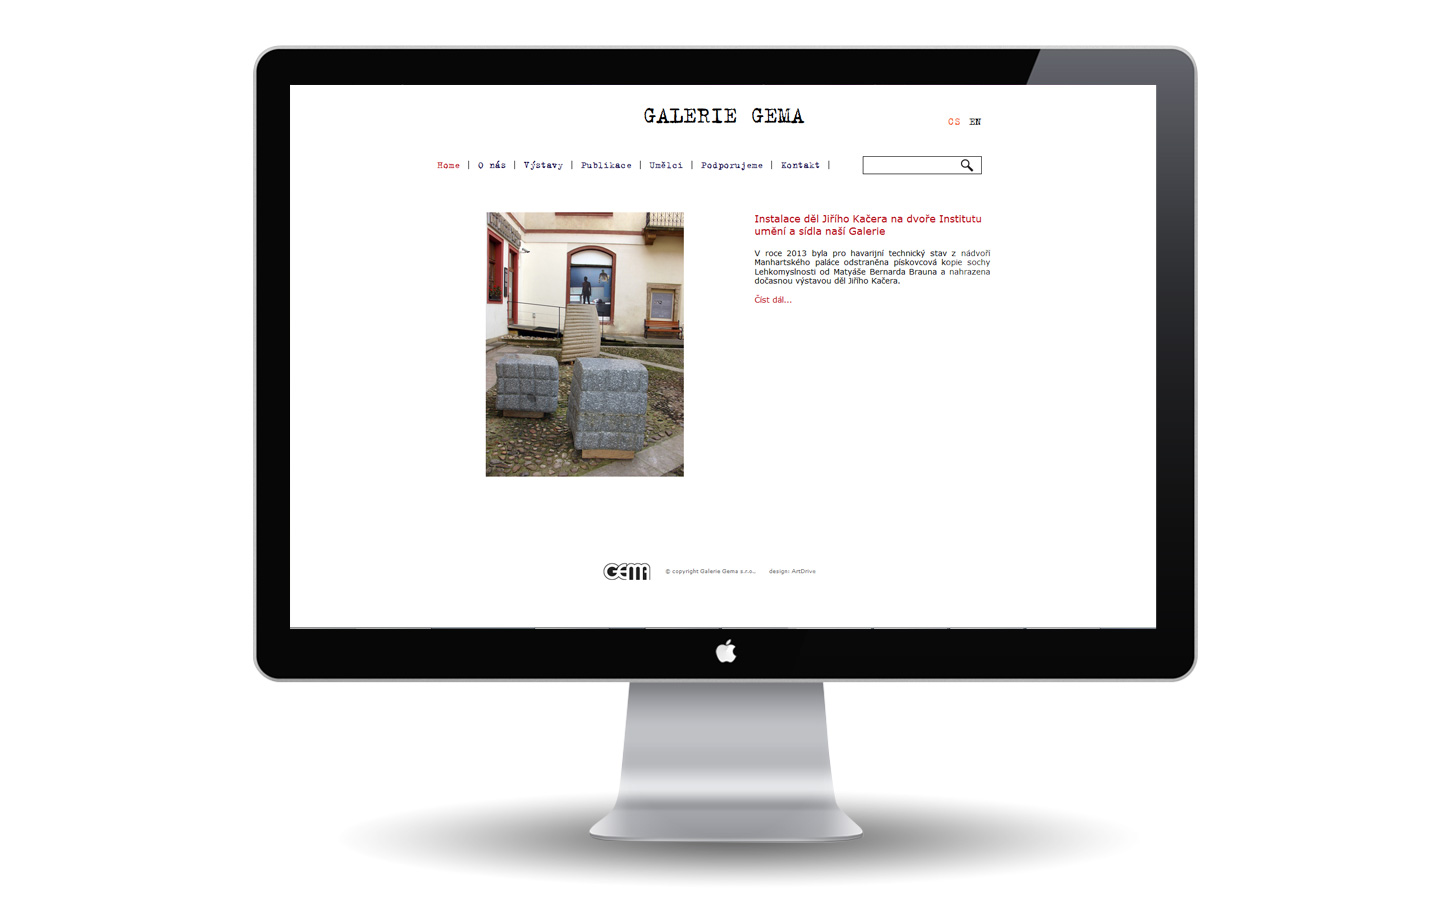 Galerie Gema - návrh a reallizace webu